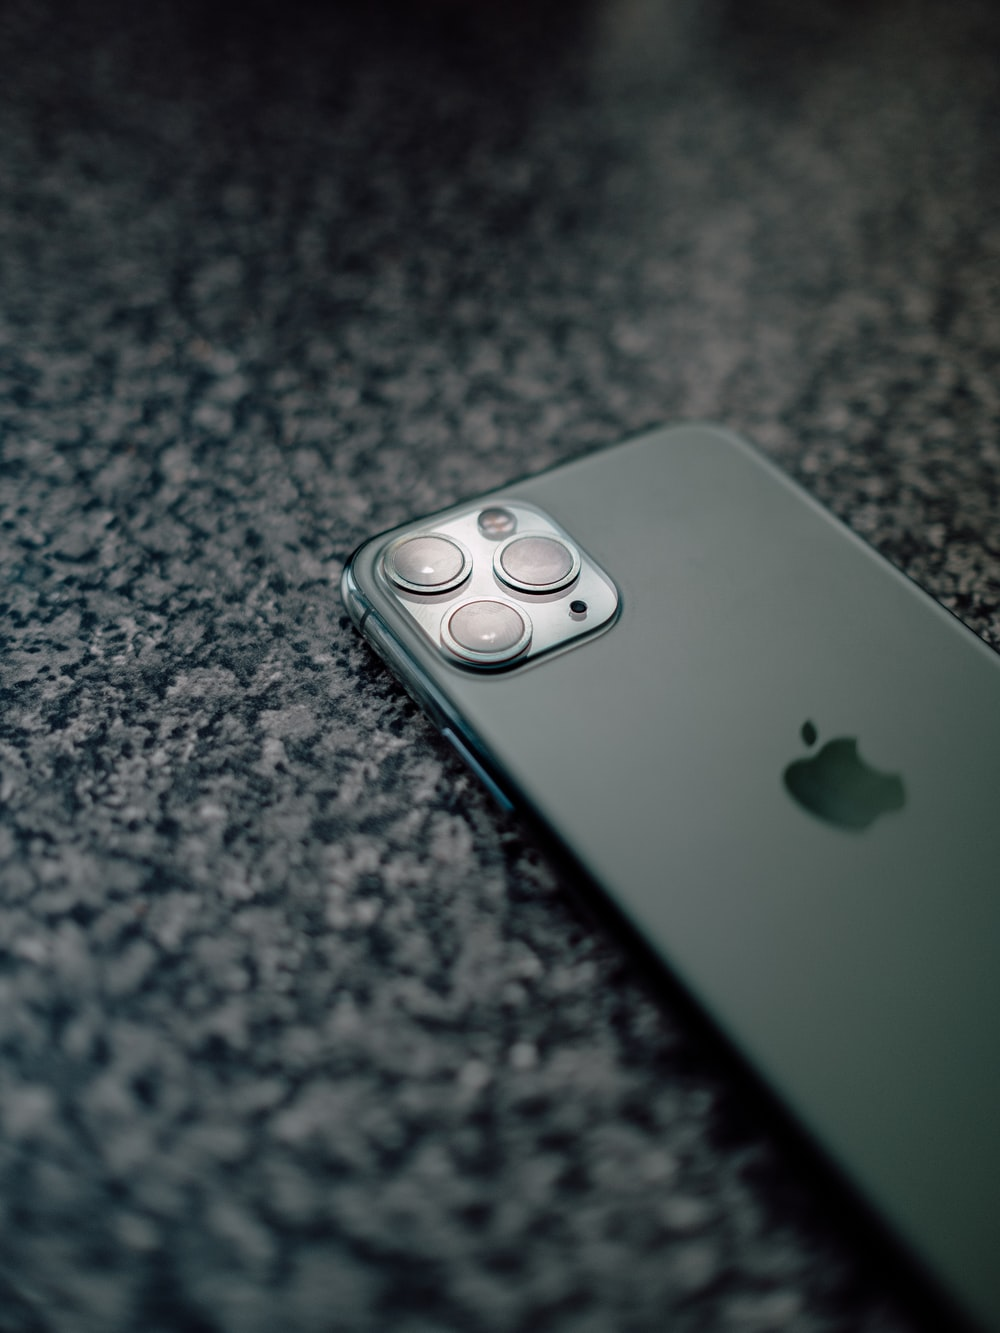 White And Gray Round Device Photo Free Grey Image On Unsplash